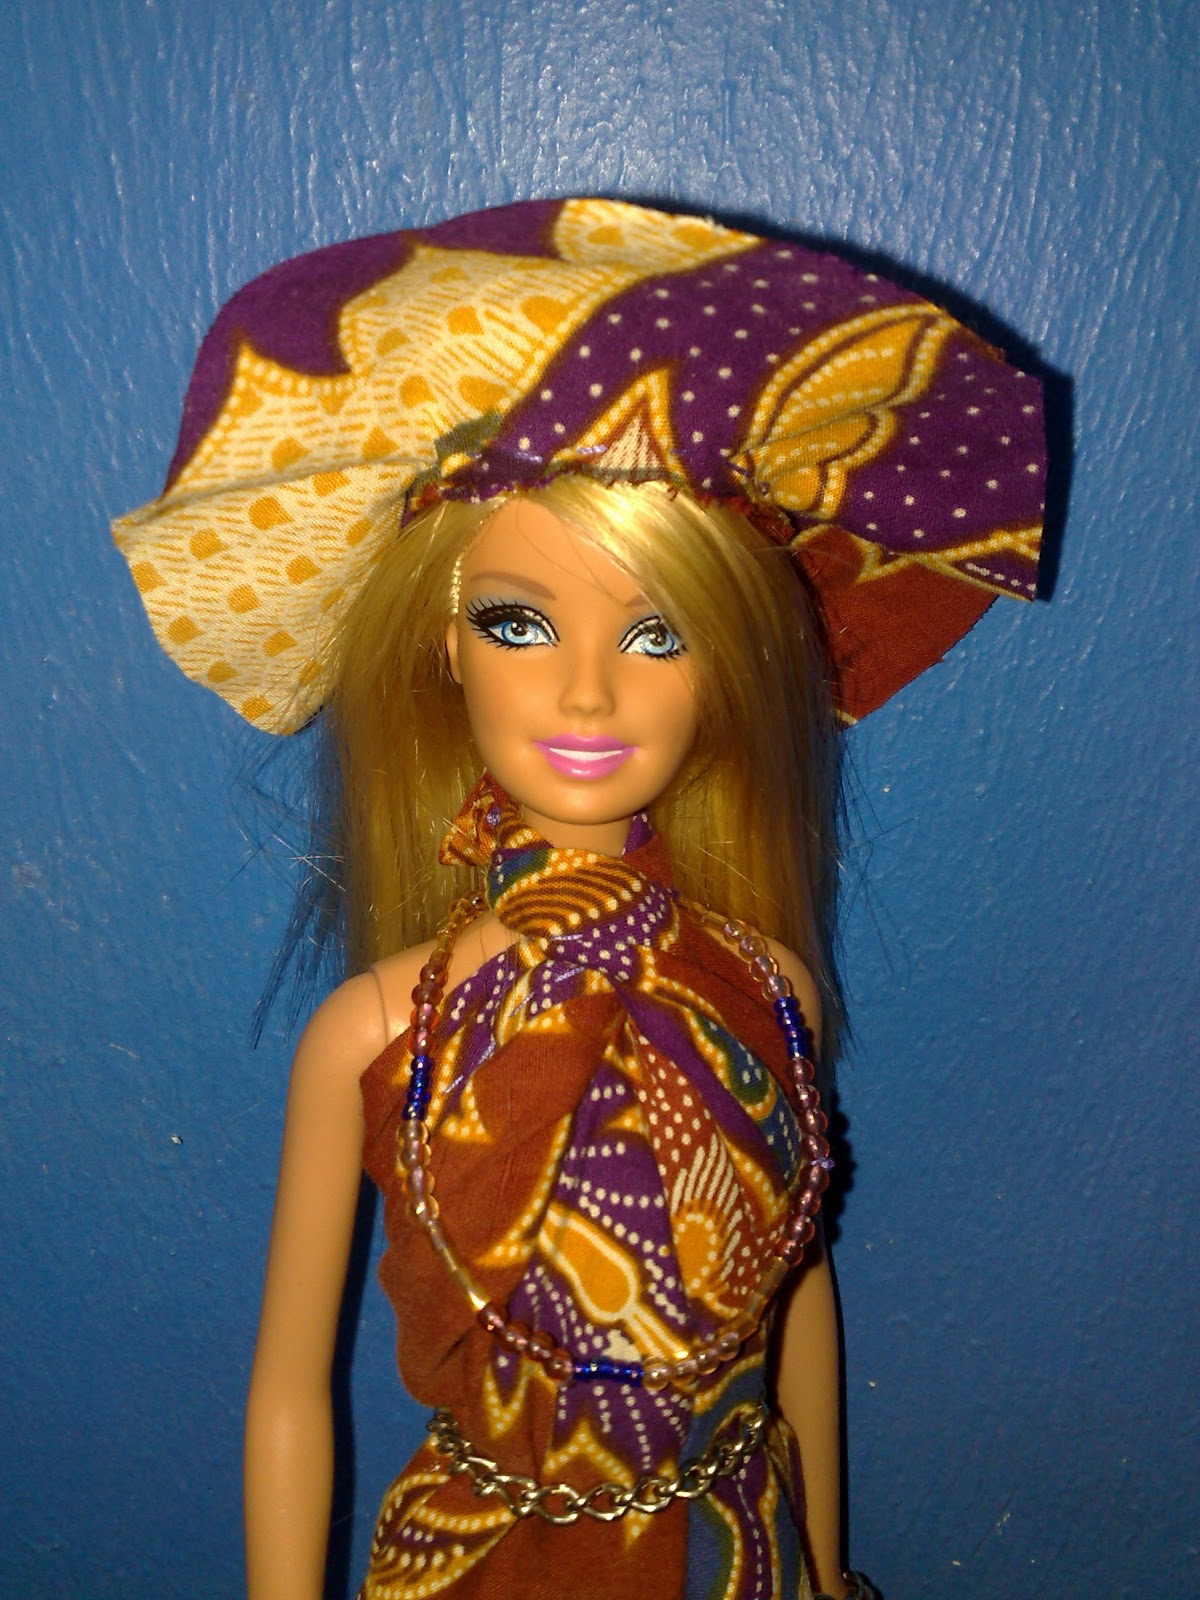 Z Arif S Malaysia Barbie Fashion Collection My 25th